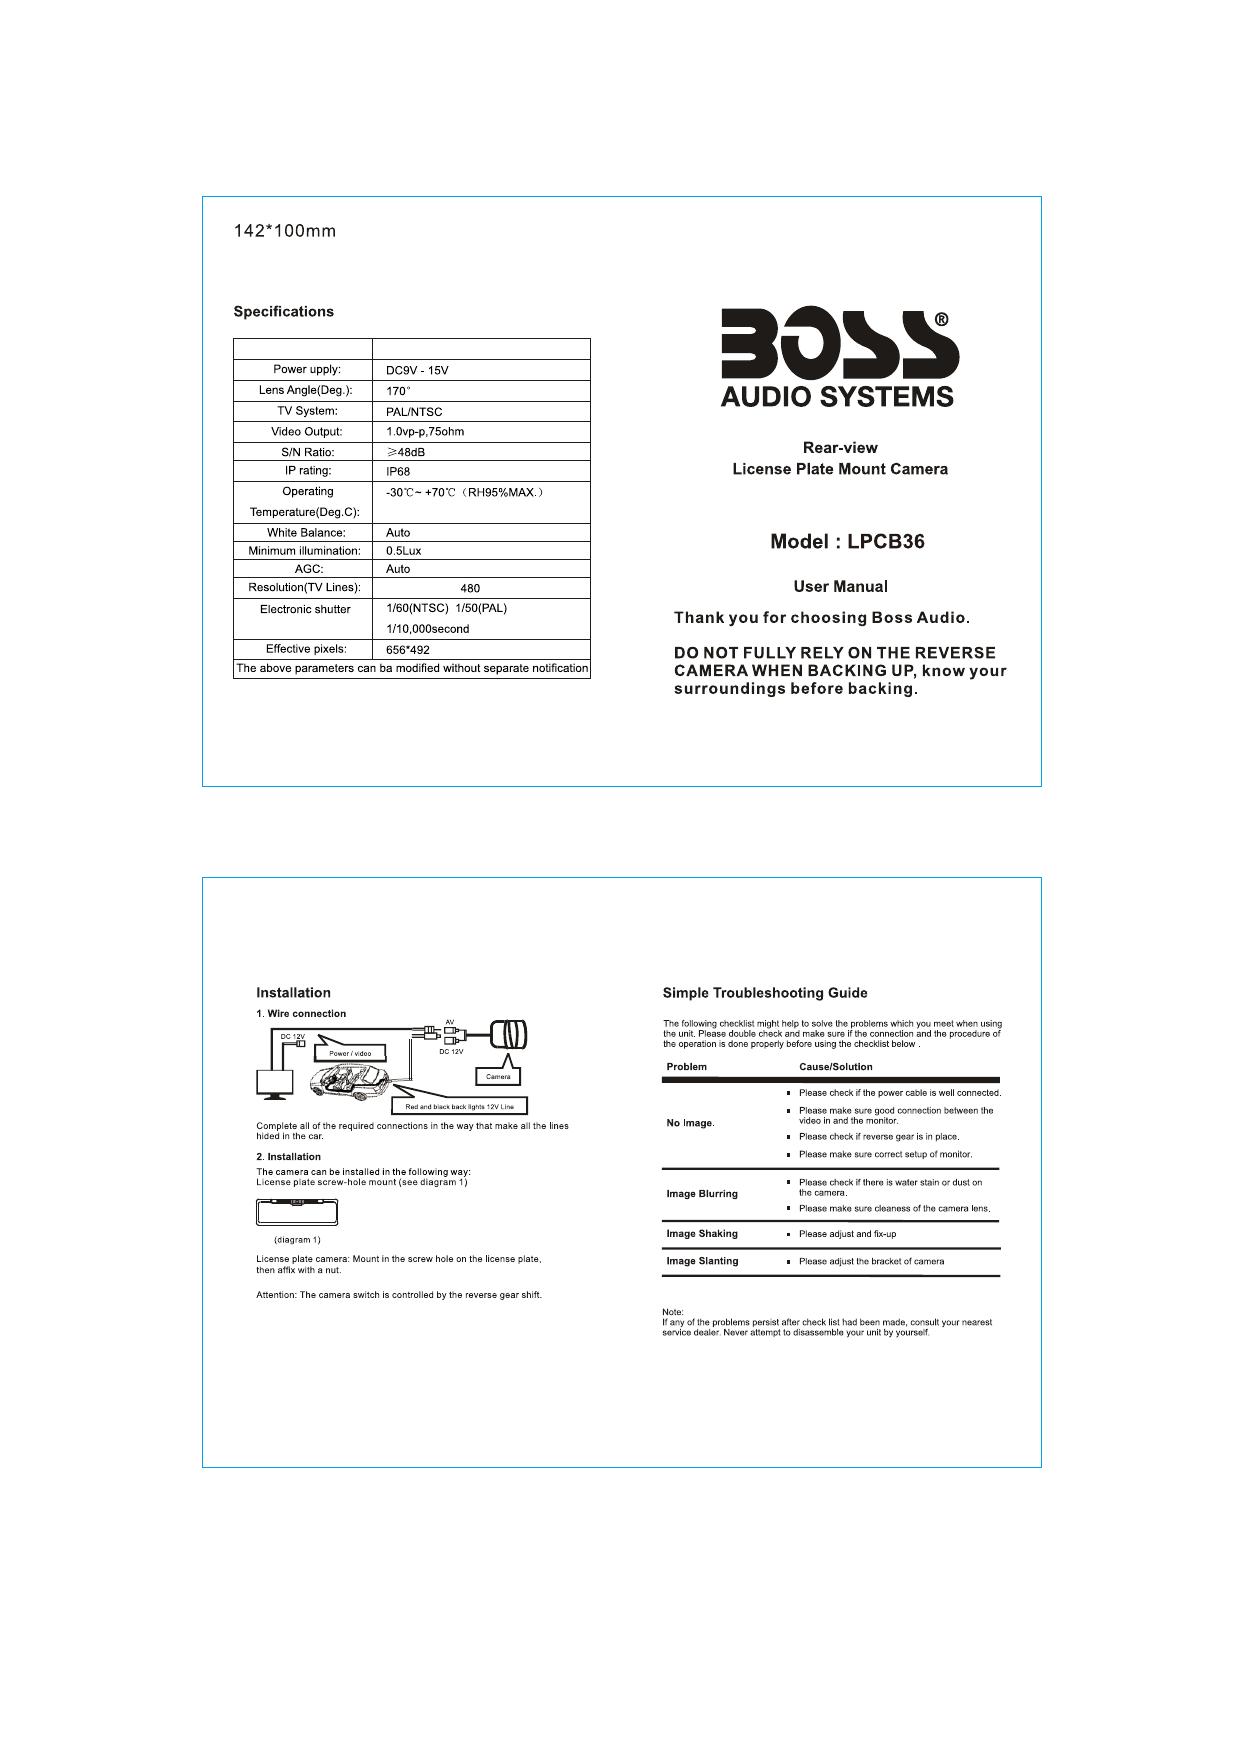 Boss Audio Systems LPCB36 User manual | ManualzzManualzz